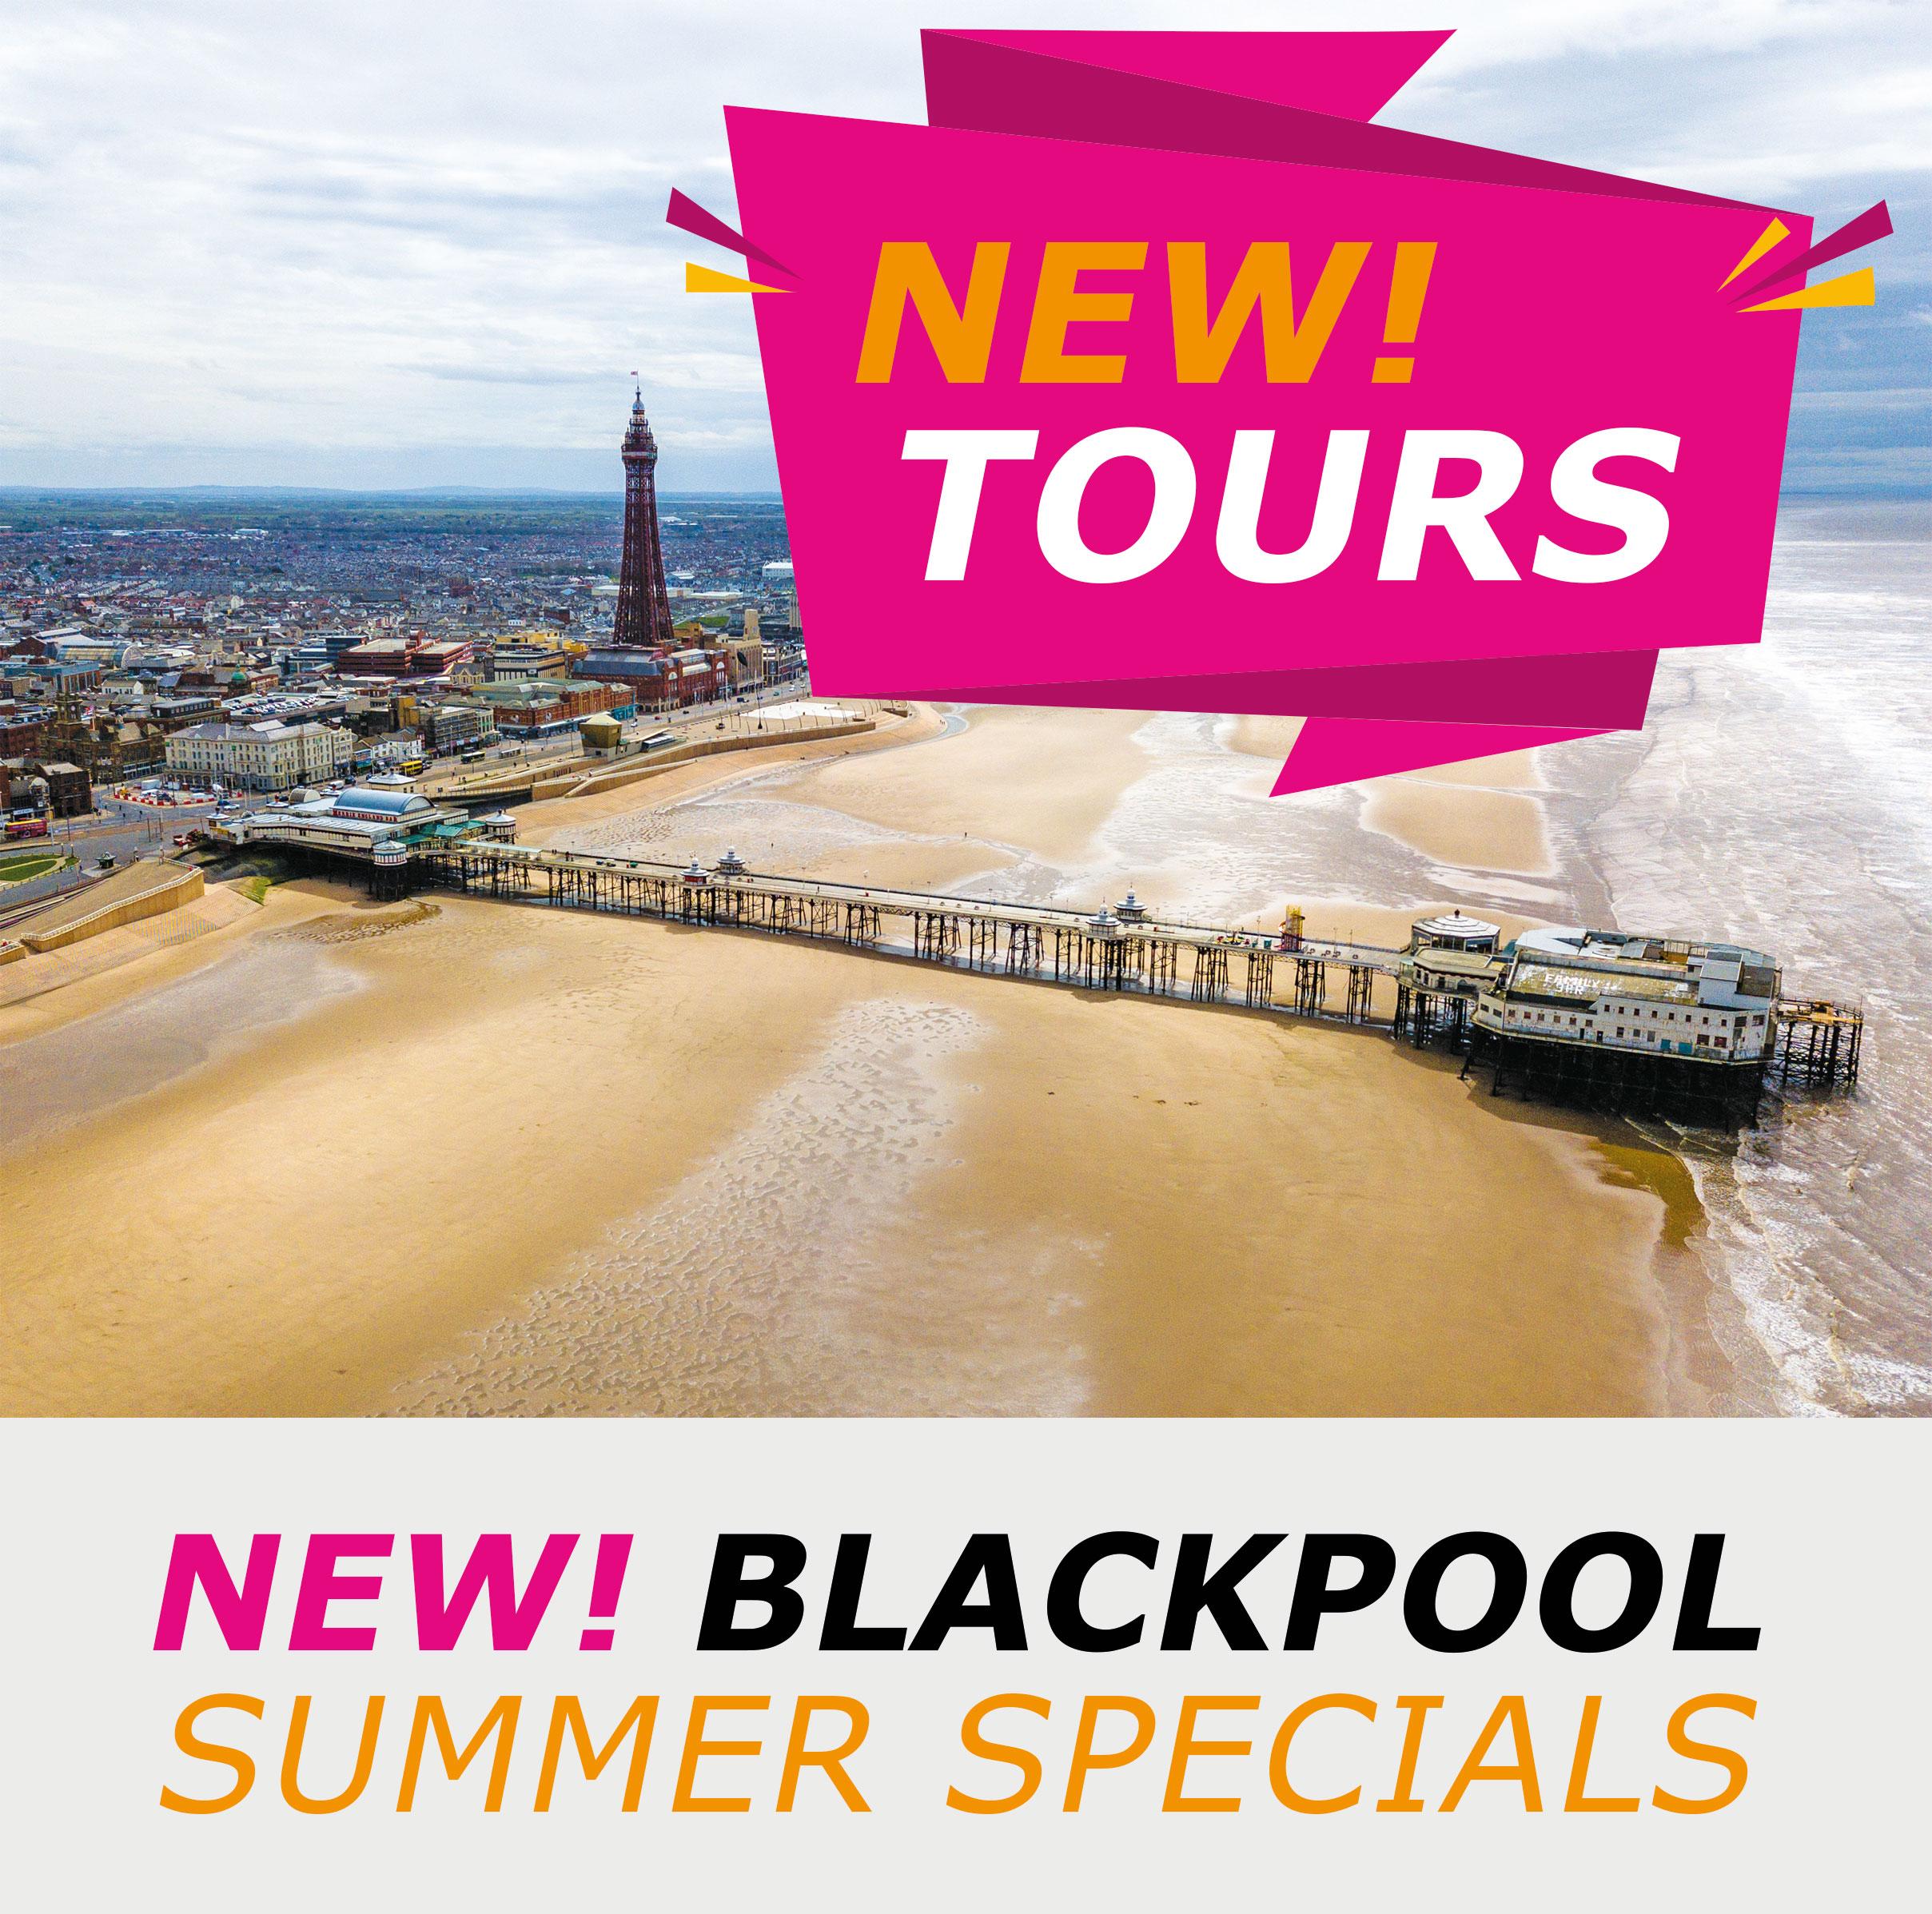 Blackpool Summer Specials